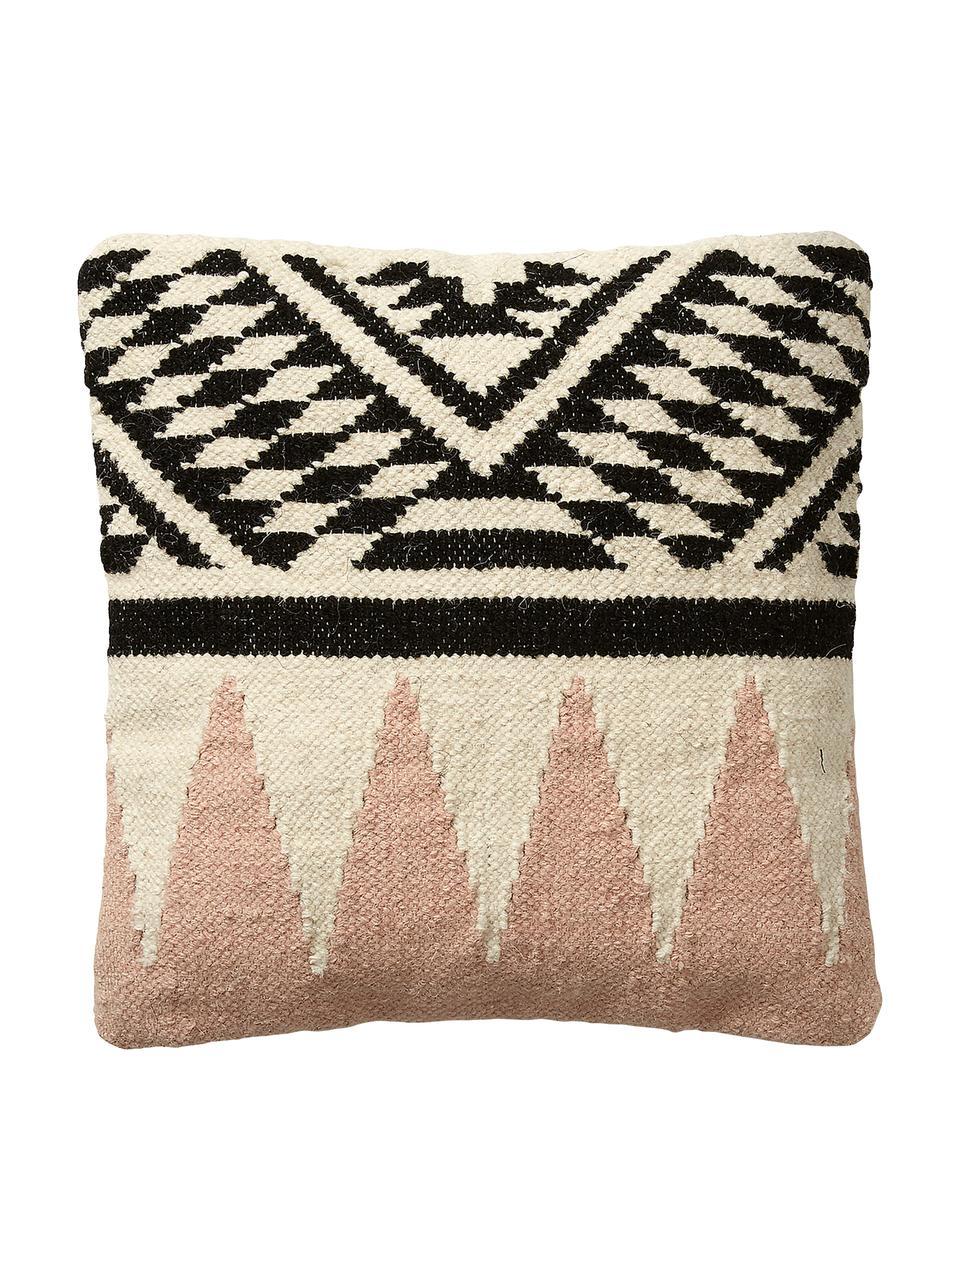 Federa arredo etnica in lana Greta, 90% lana, 10% cotone, Beige, nero, rosa, Larg. 45 x Lung. 45 cm